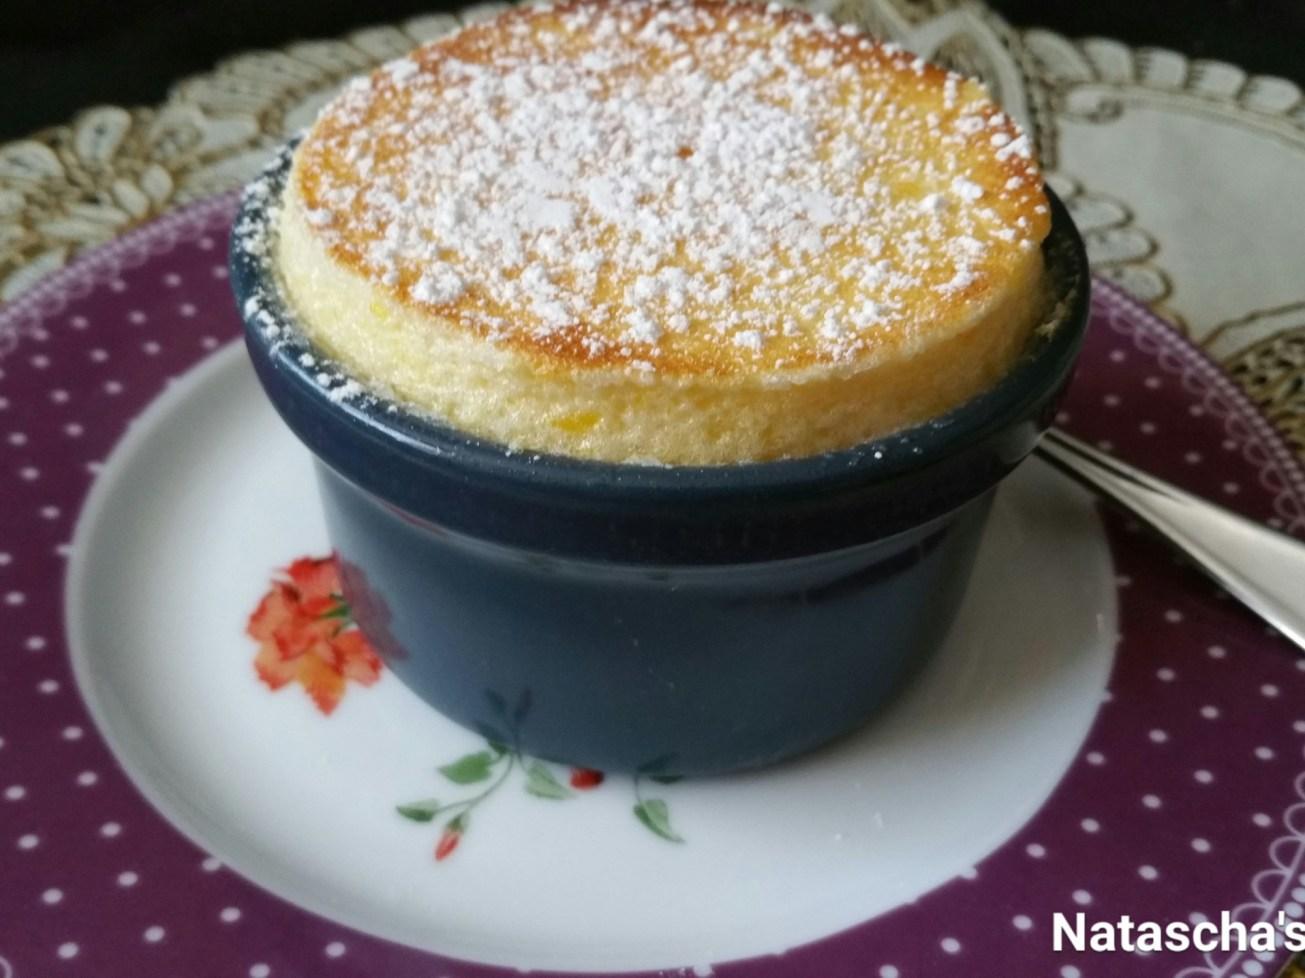 Natascha's mango soufflé